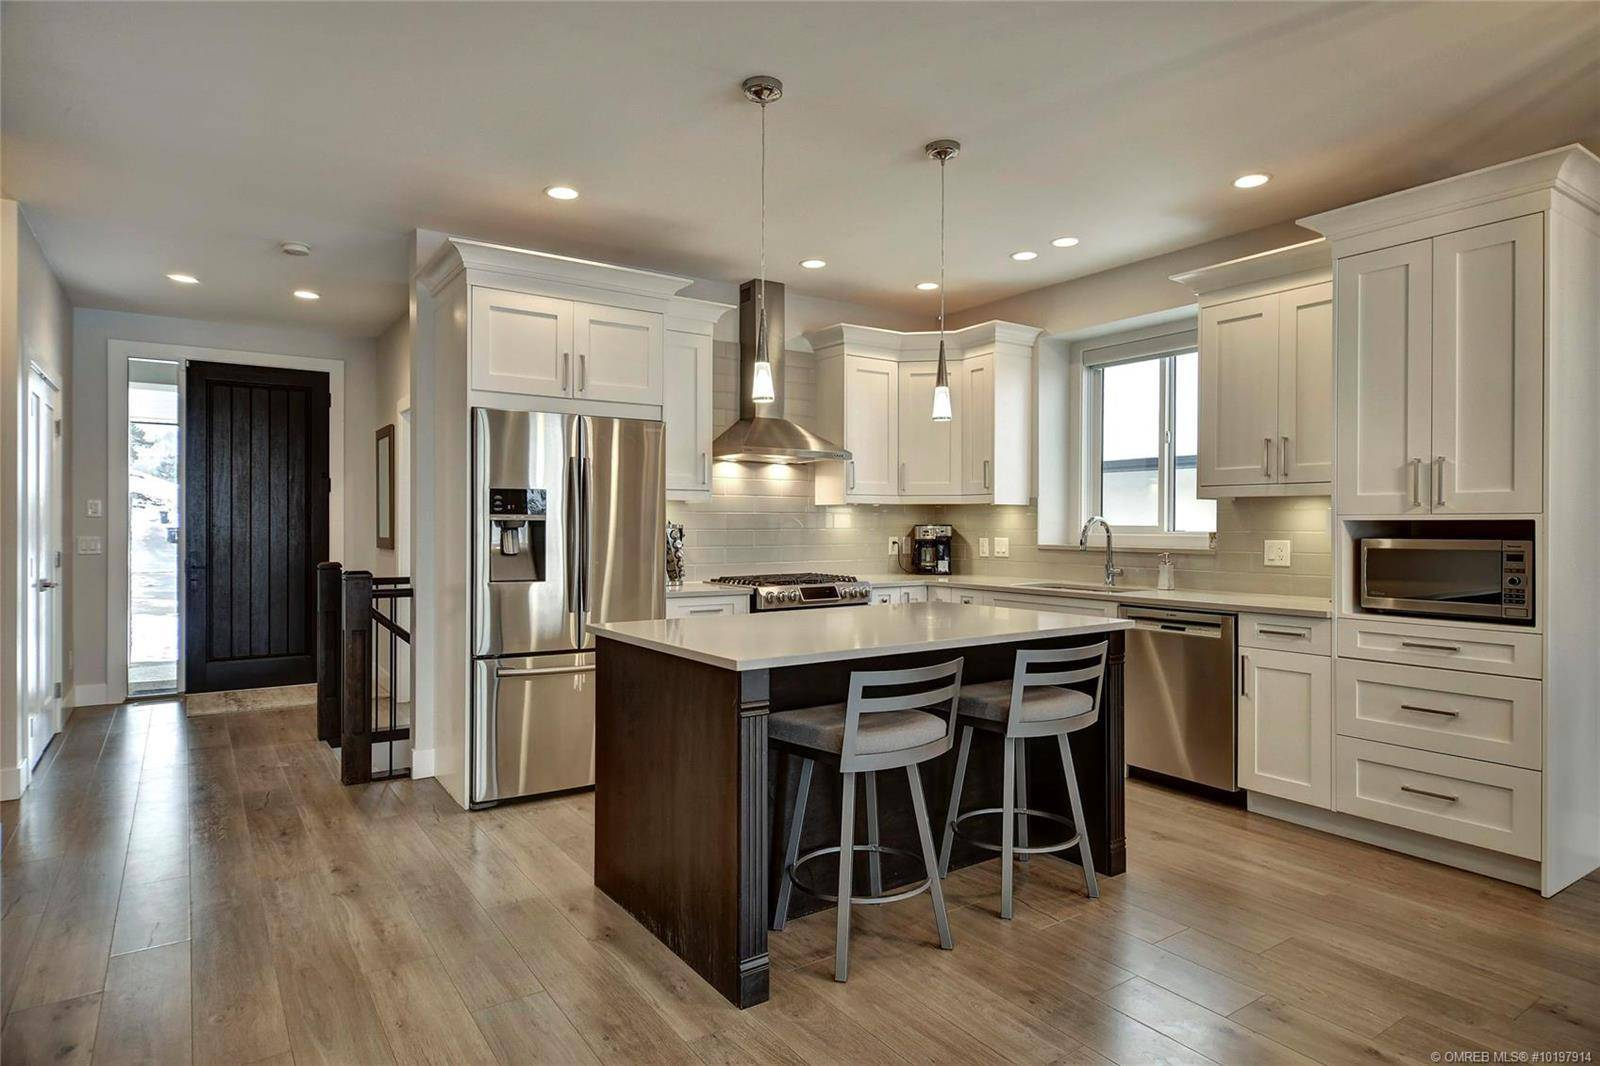 House for sale at 1733 Broadview Ave Kelowna British Columbia - MLS: 10197914